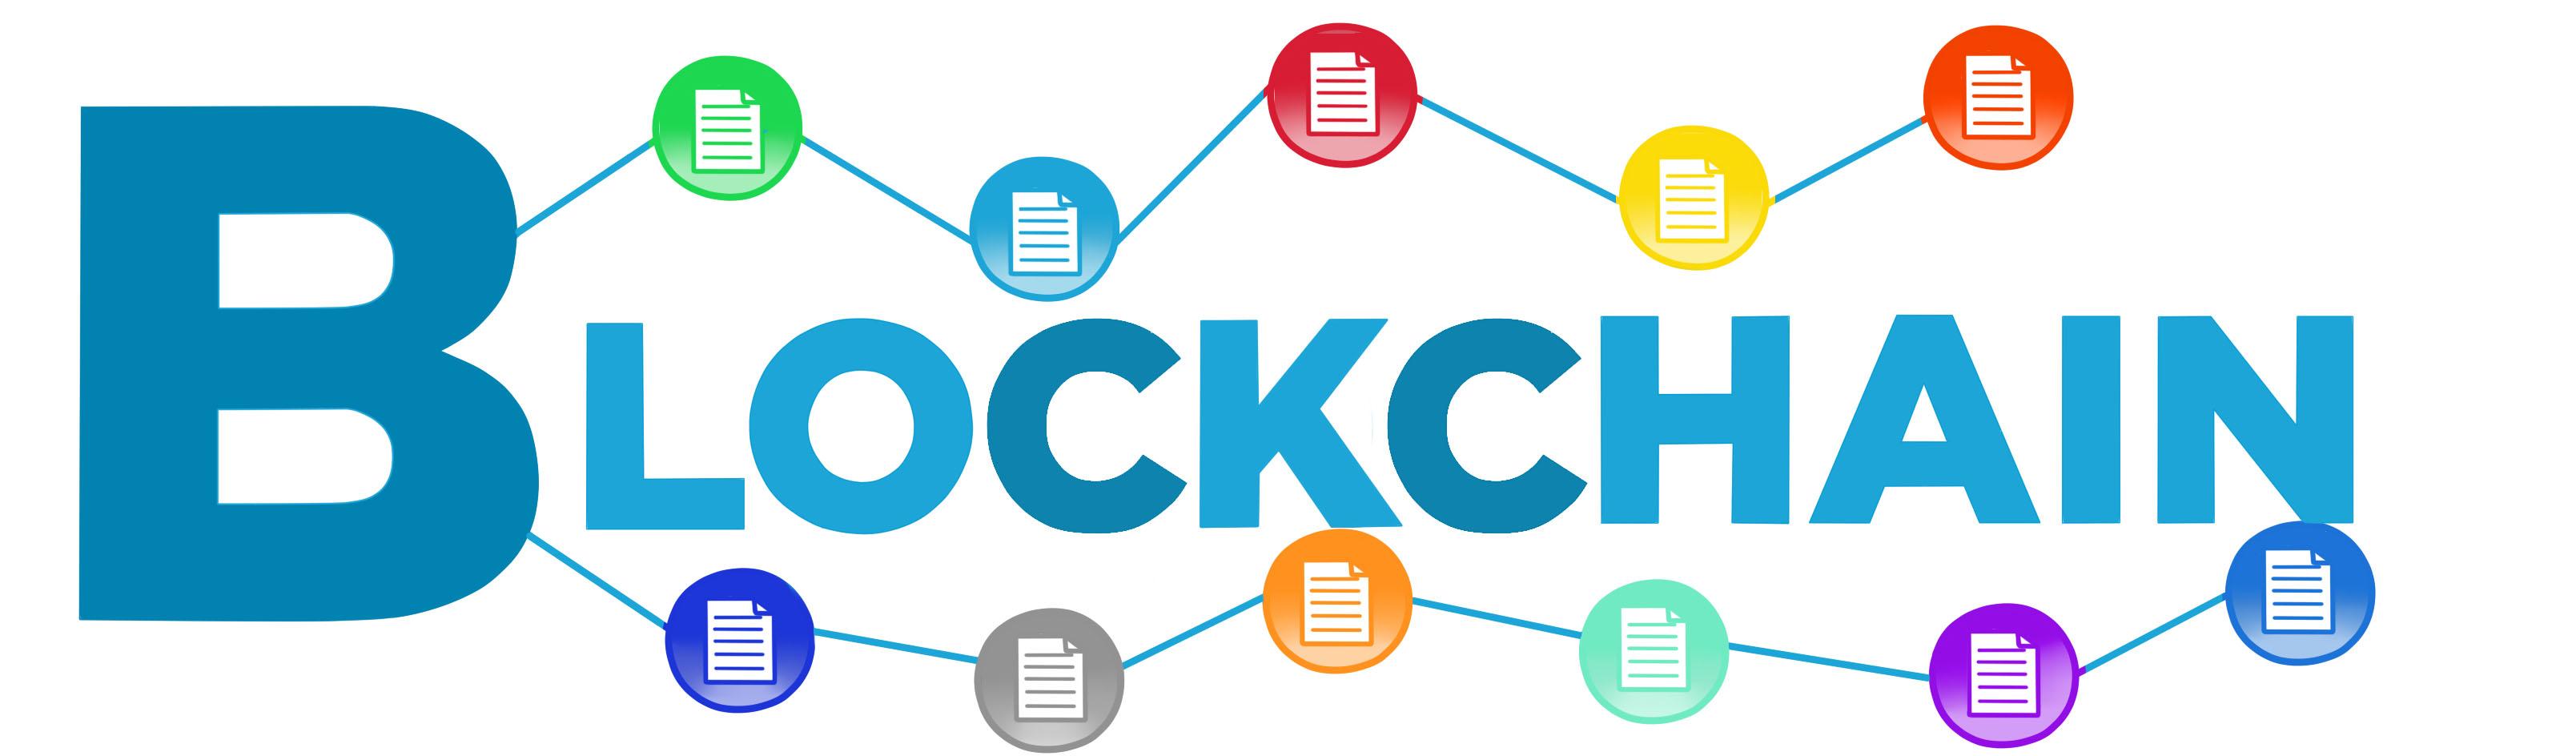 Soyez zen avec la technologie blockchain